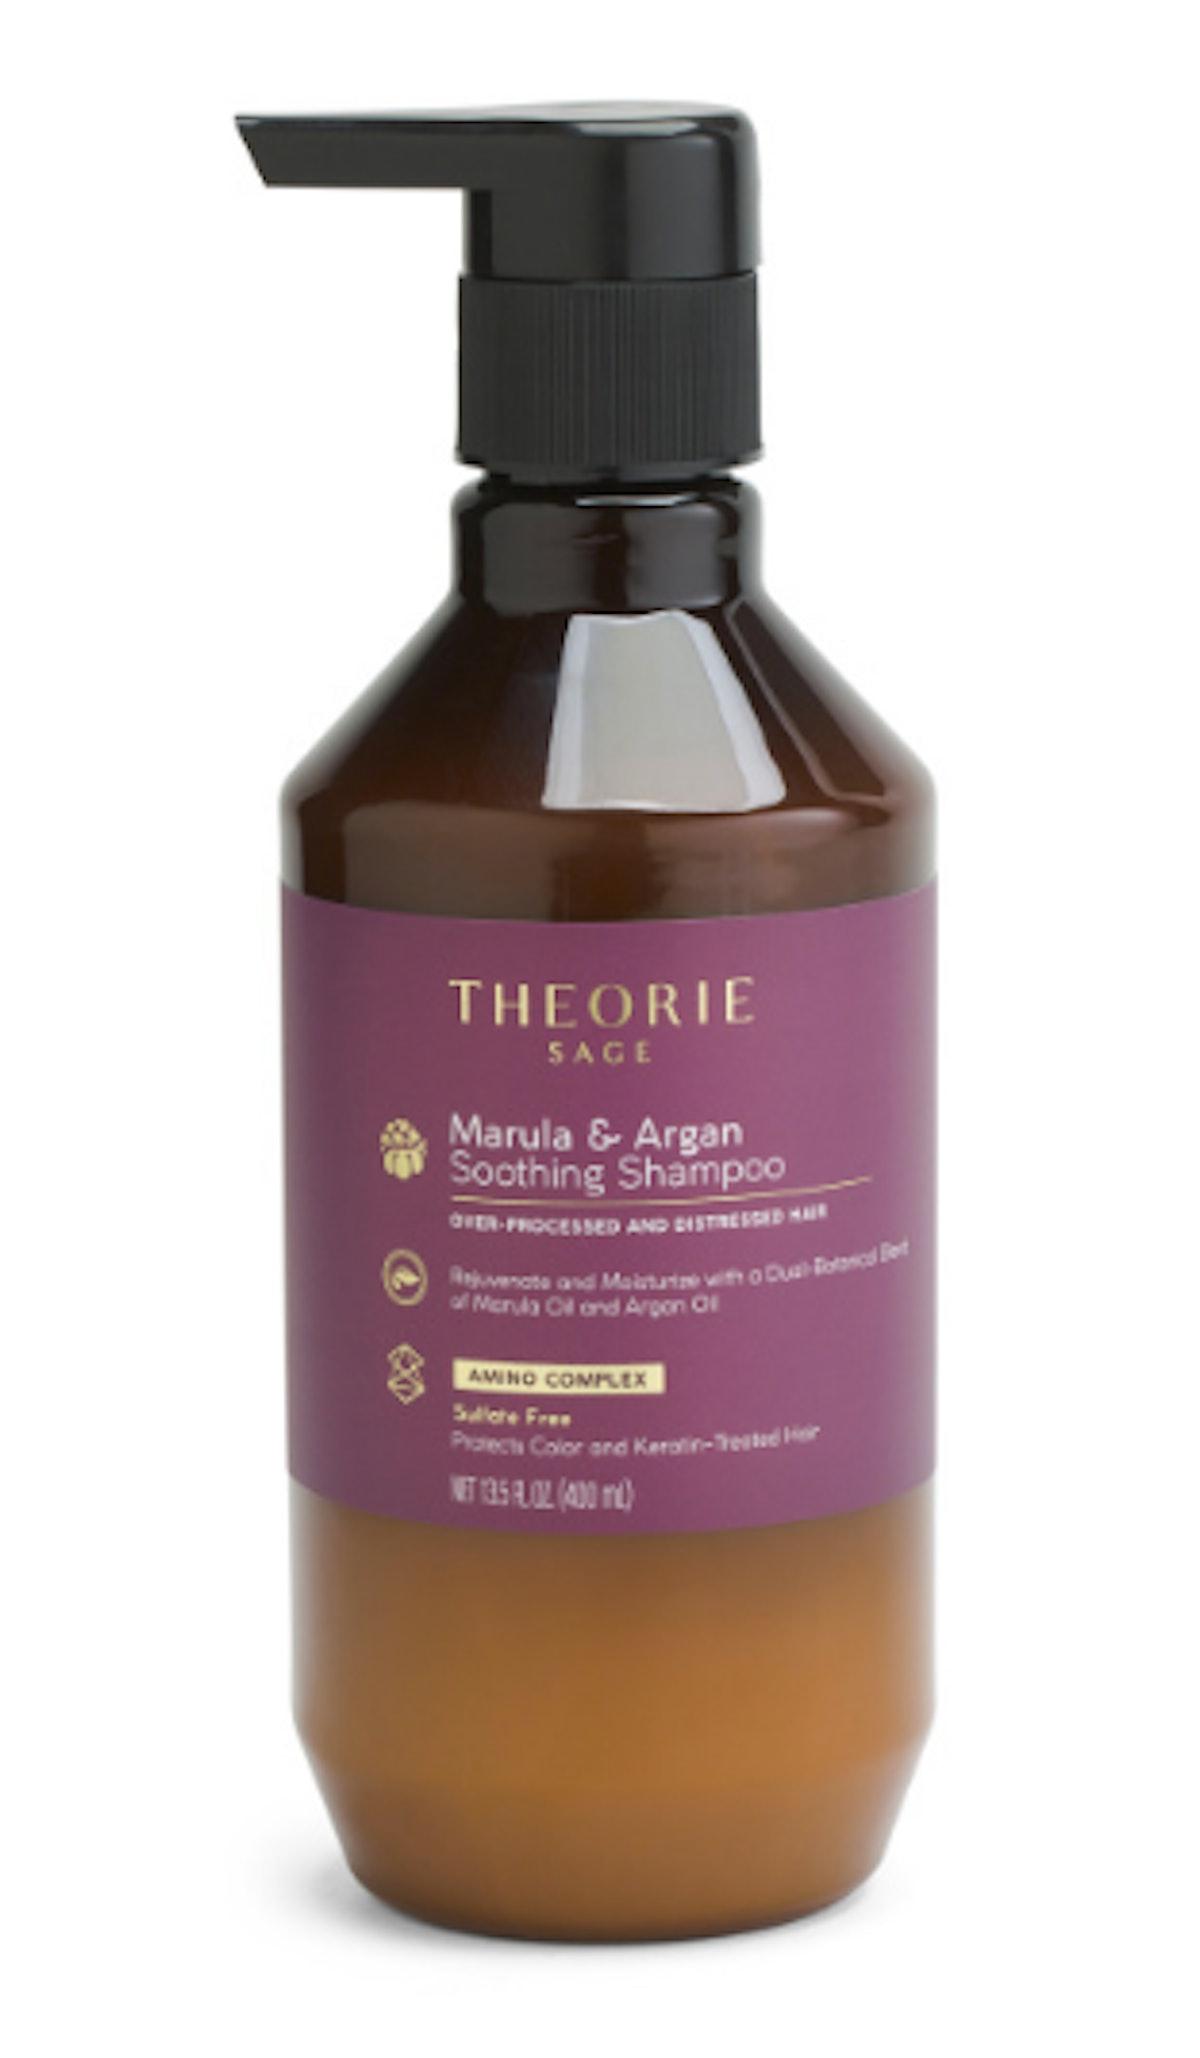 Theorie Marula And Argan Oil Repairing Shampoo